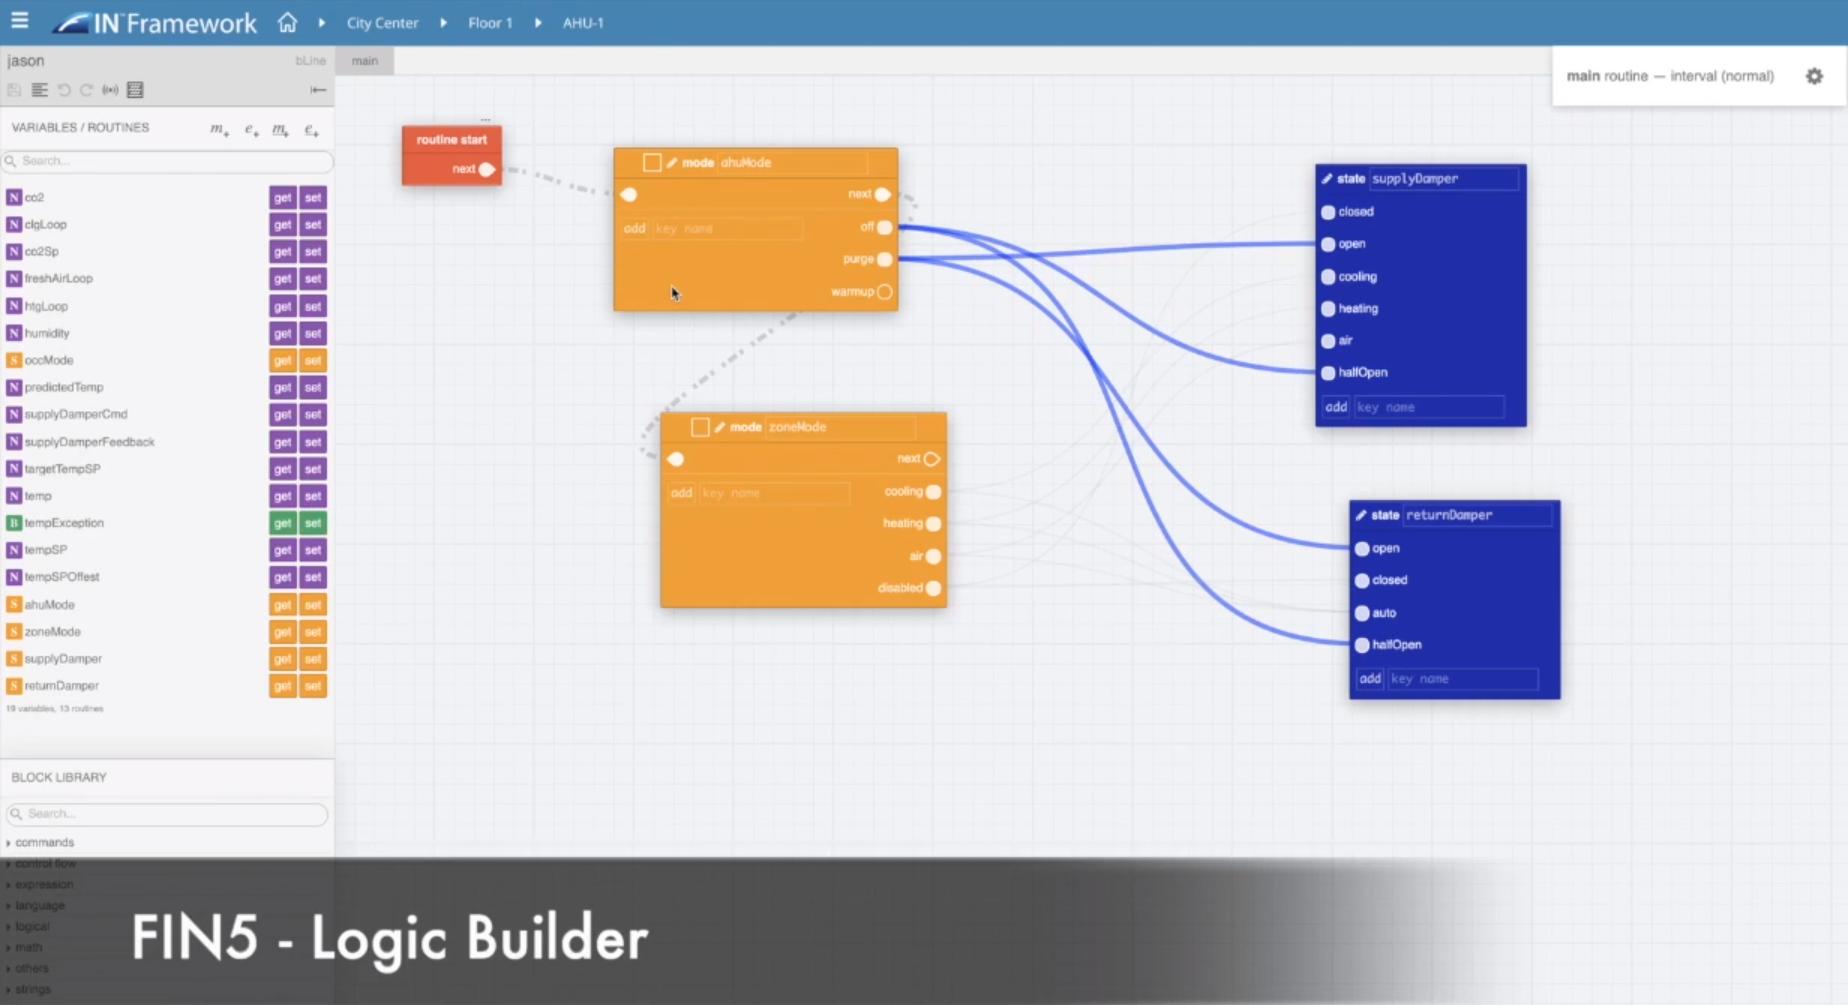 Logic Builder